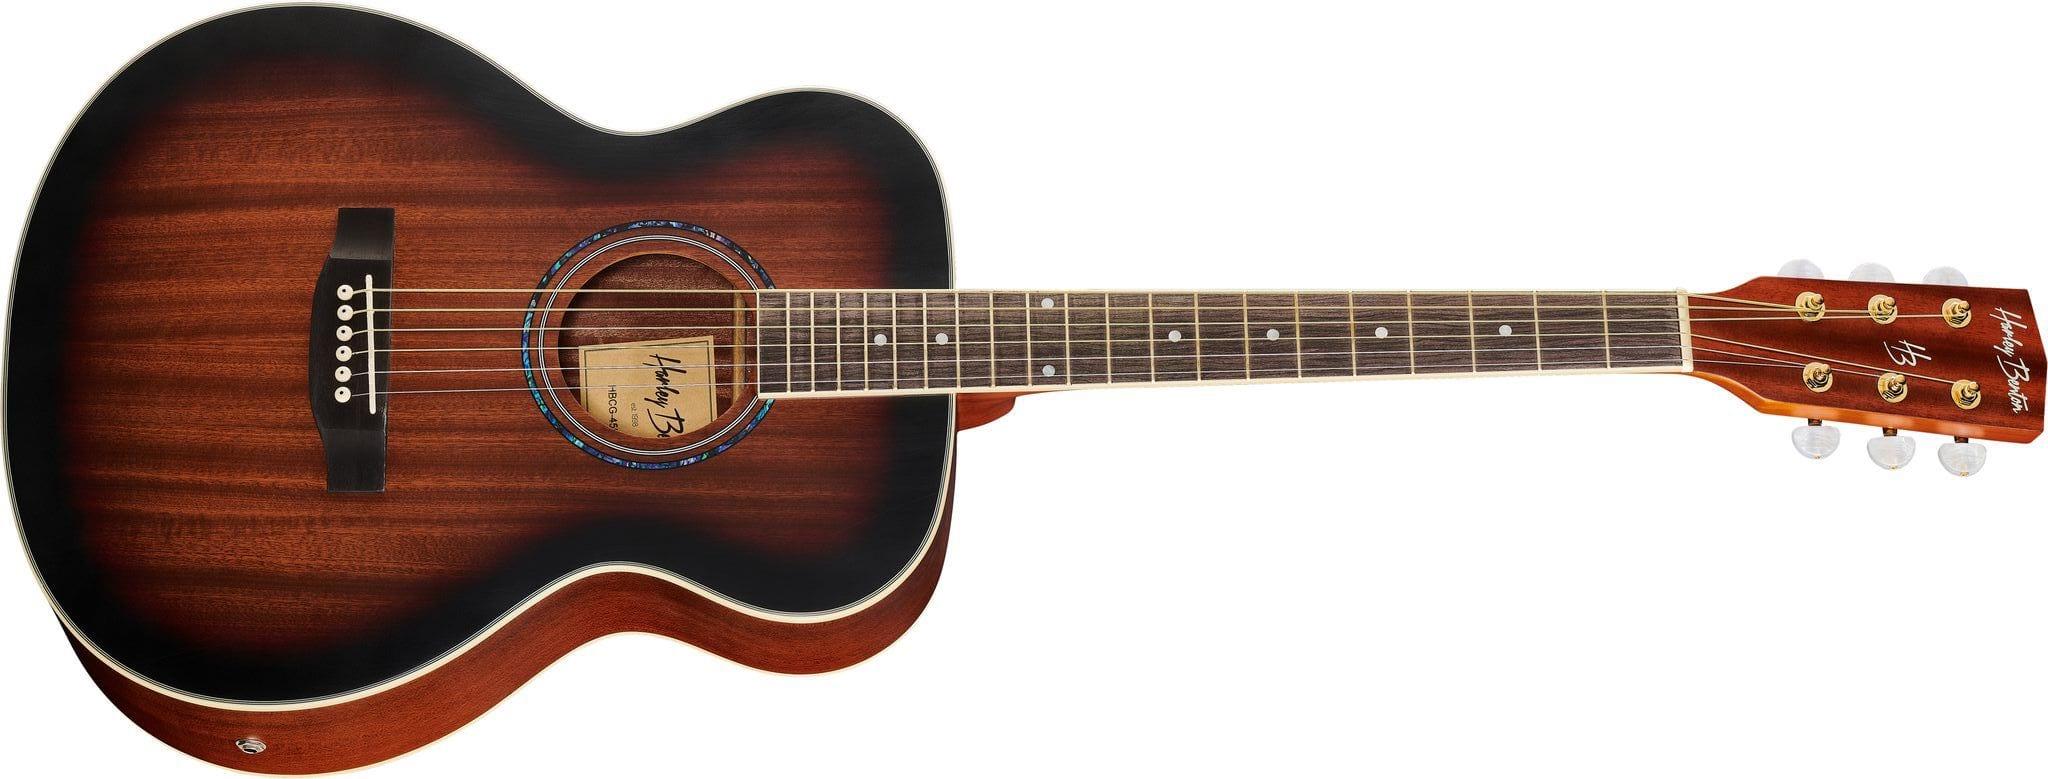 Harley Benton CG-45E an all mahogany grand concert acoustic